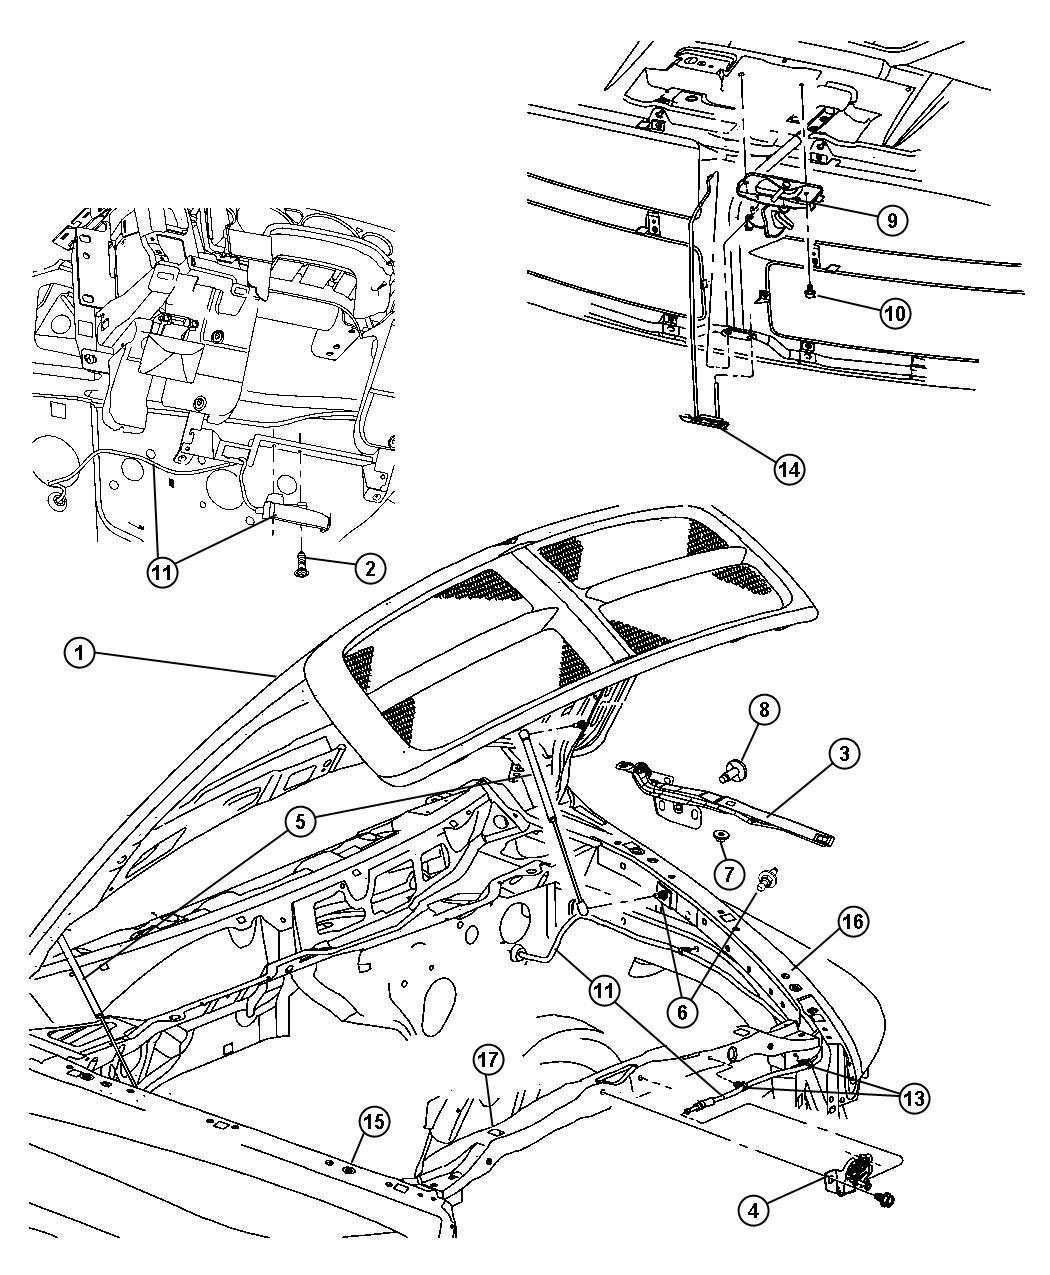 2005 dodge ram 1500 hinge left hood body glass - 2005 dodge ram 1500 interior parts ...